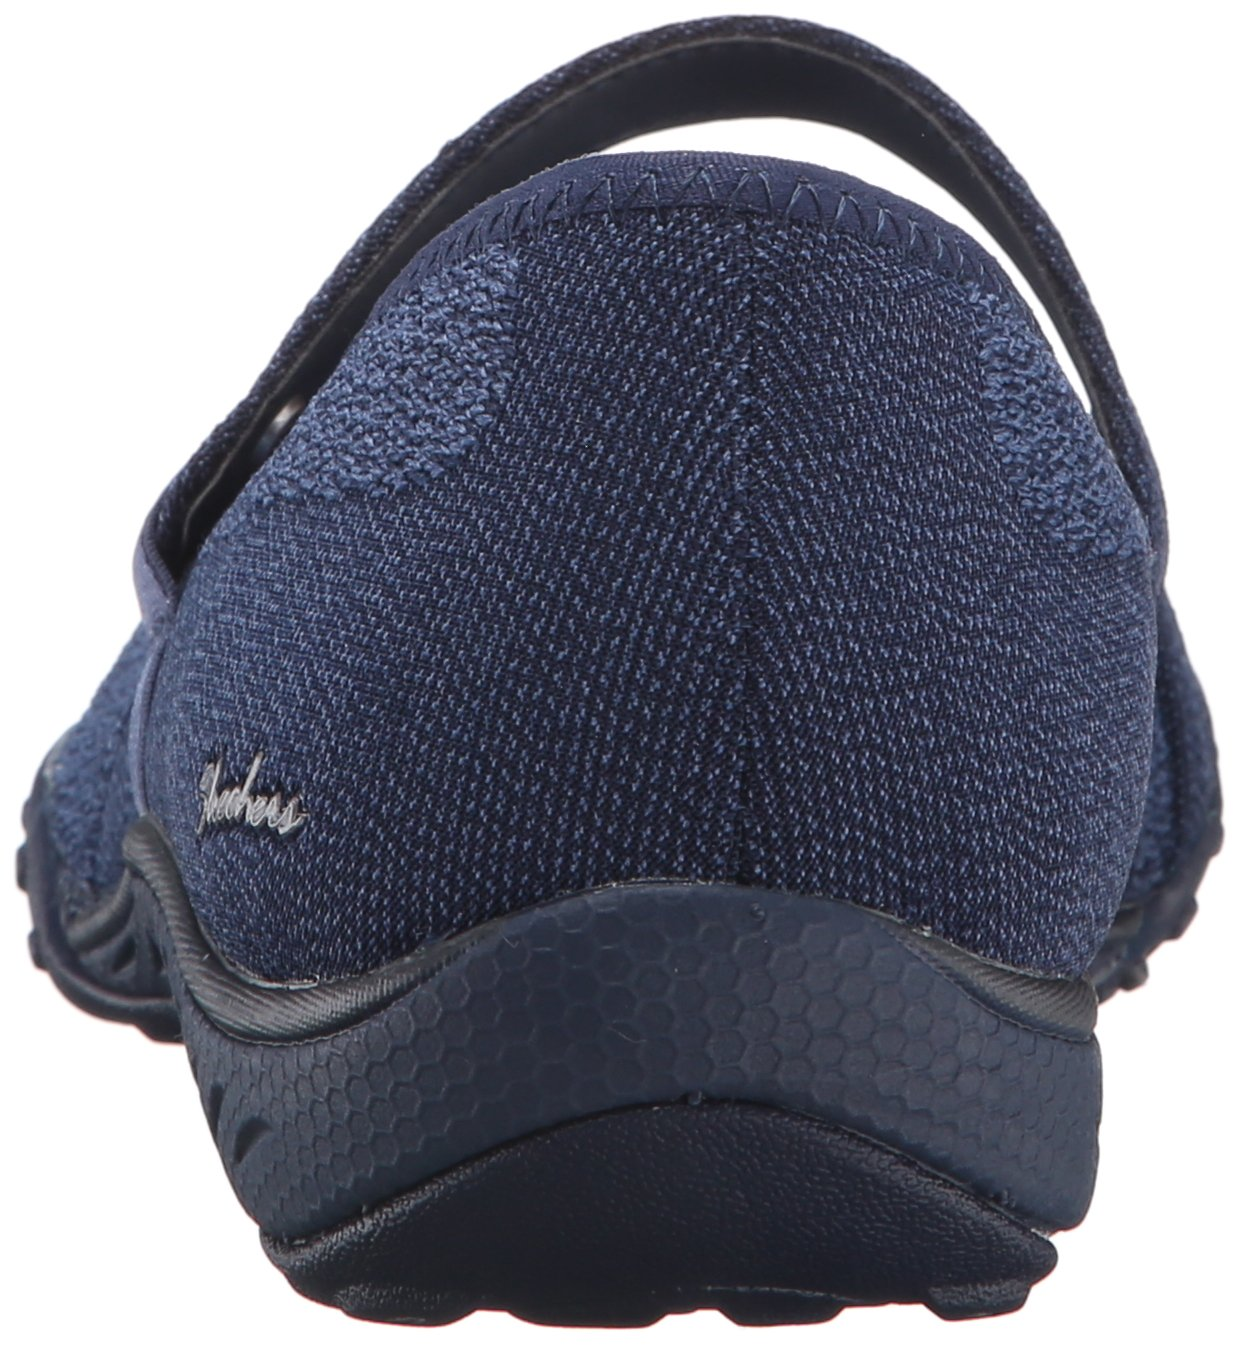 Skechers Sport Women's Breathe Easy Lovestory Mary Jane Flat B01B64BRT6 6.5 B(M) US Navy